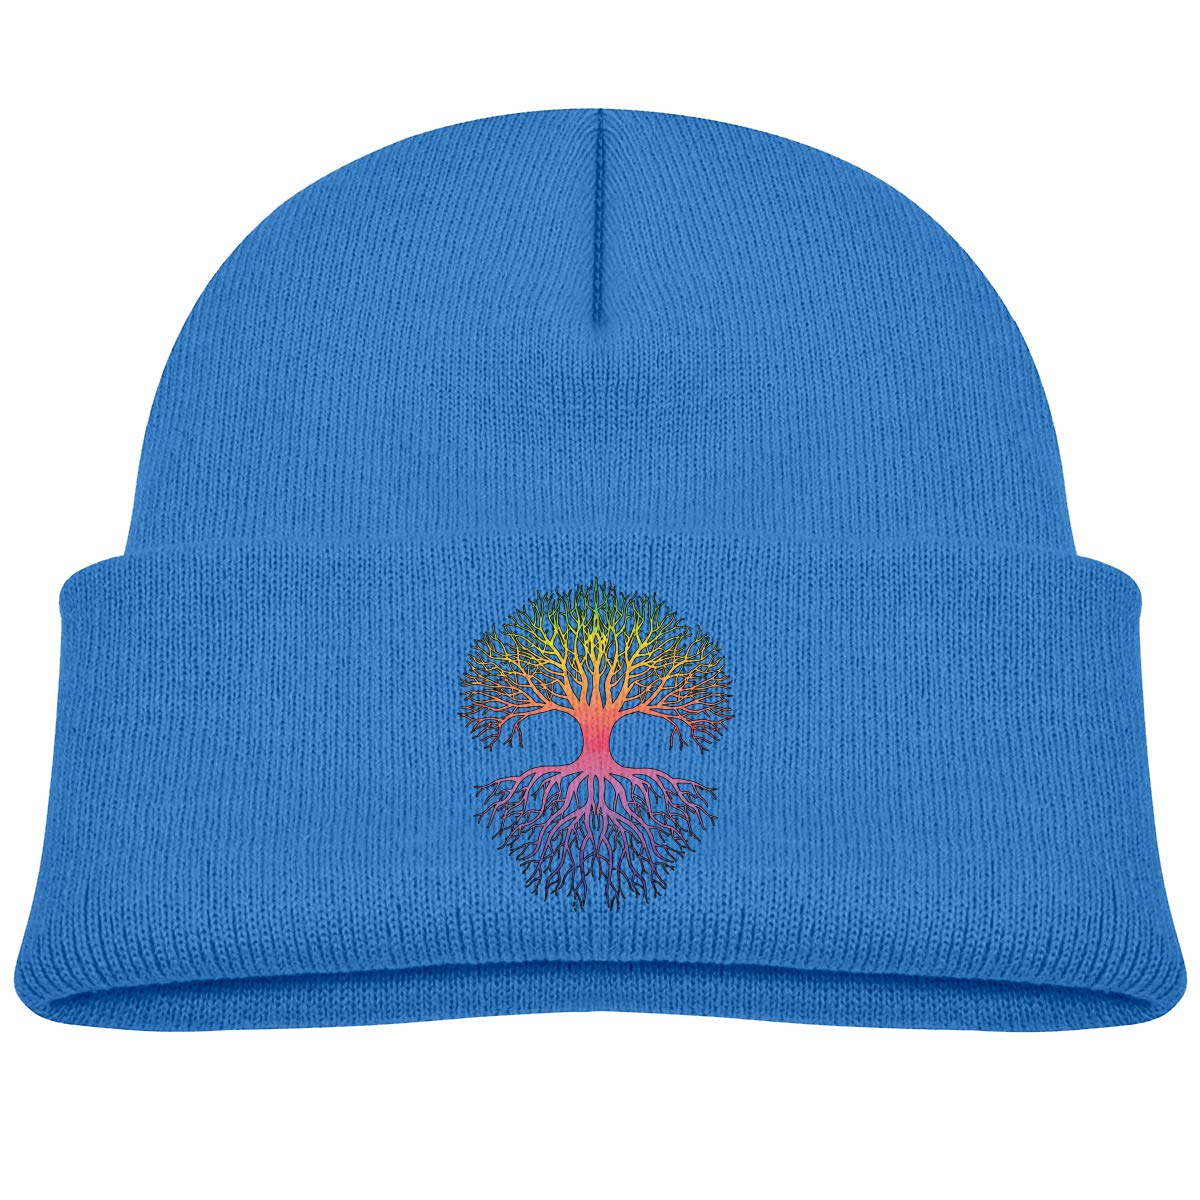 XKAWPC Tree of Life Knitted Hat Winter Skull Beanies Childrens Cuffed Plain Cap